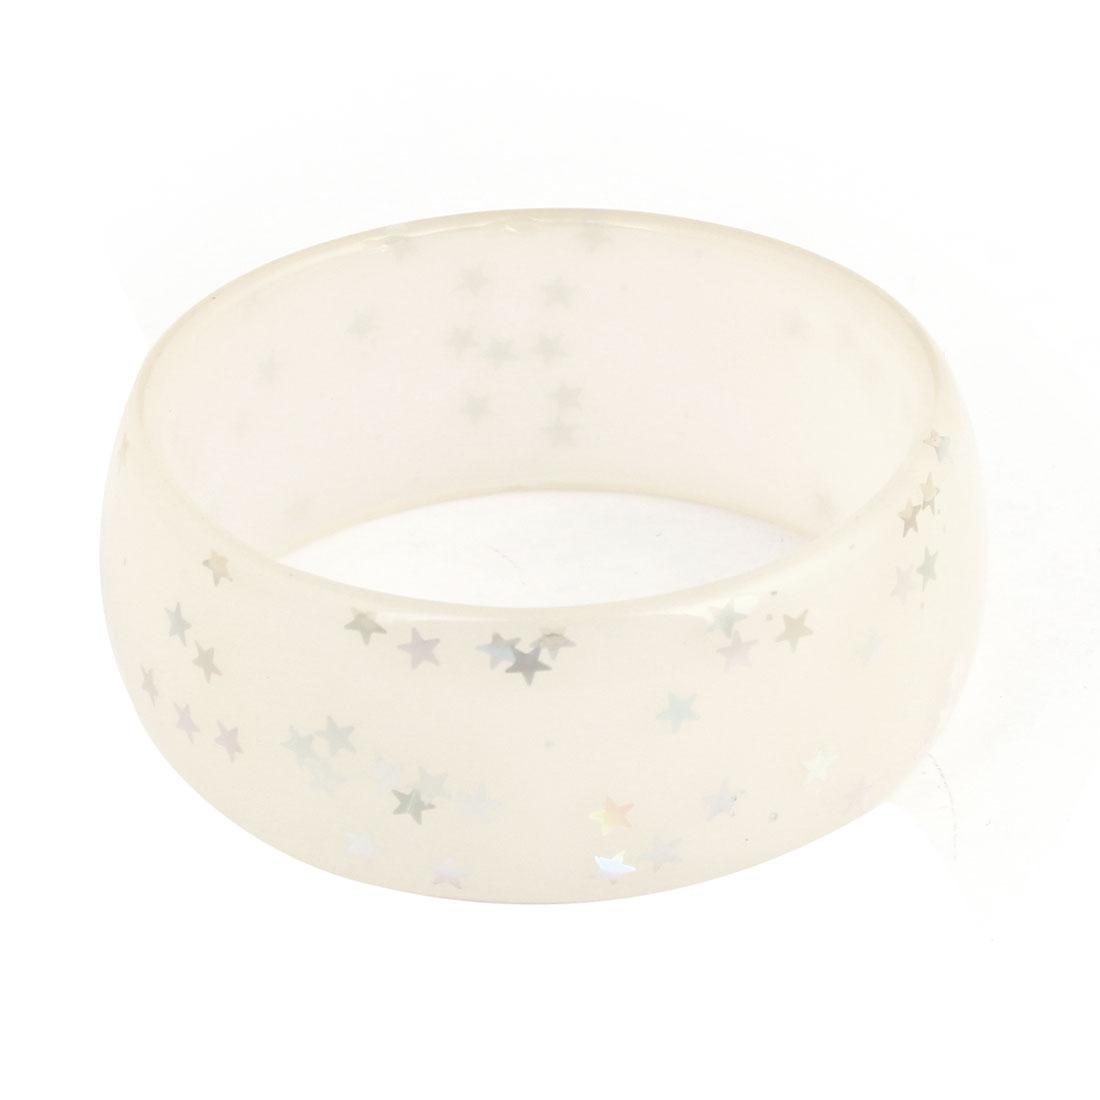 Clear White Plastic Glittery Star Pattern Wrist Ornament Bangle Bracelet